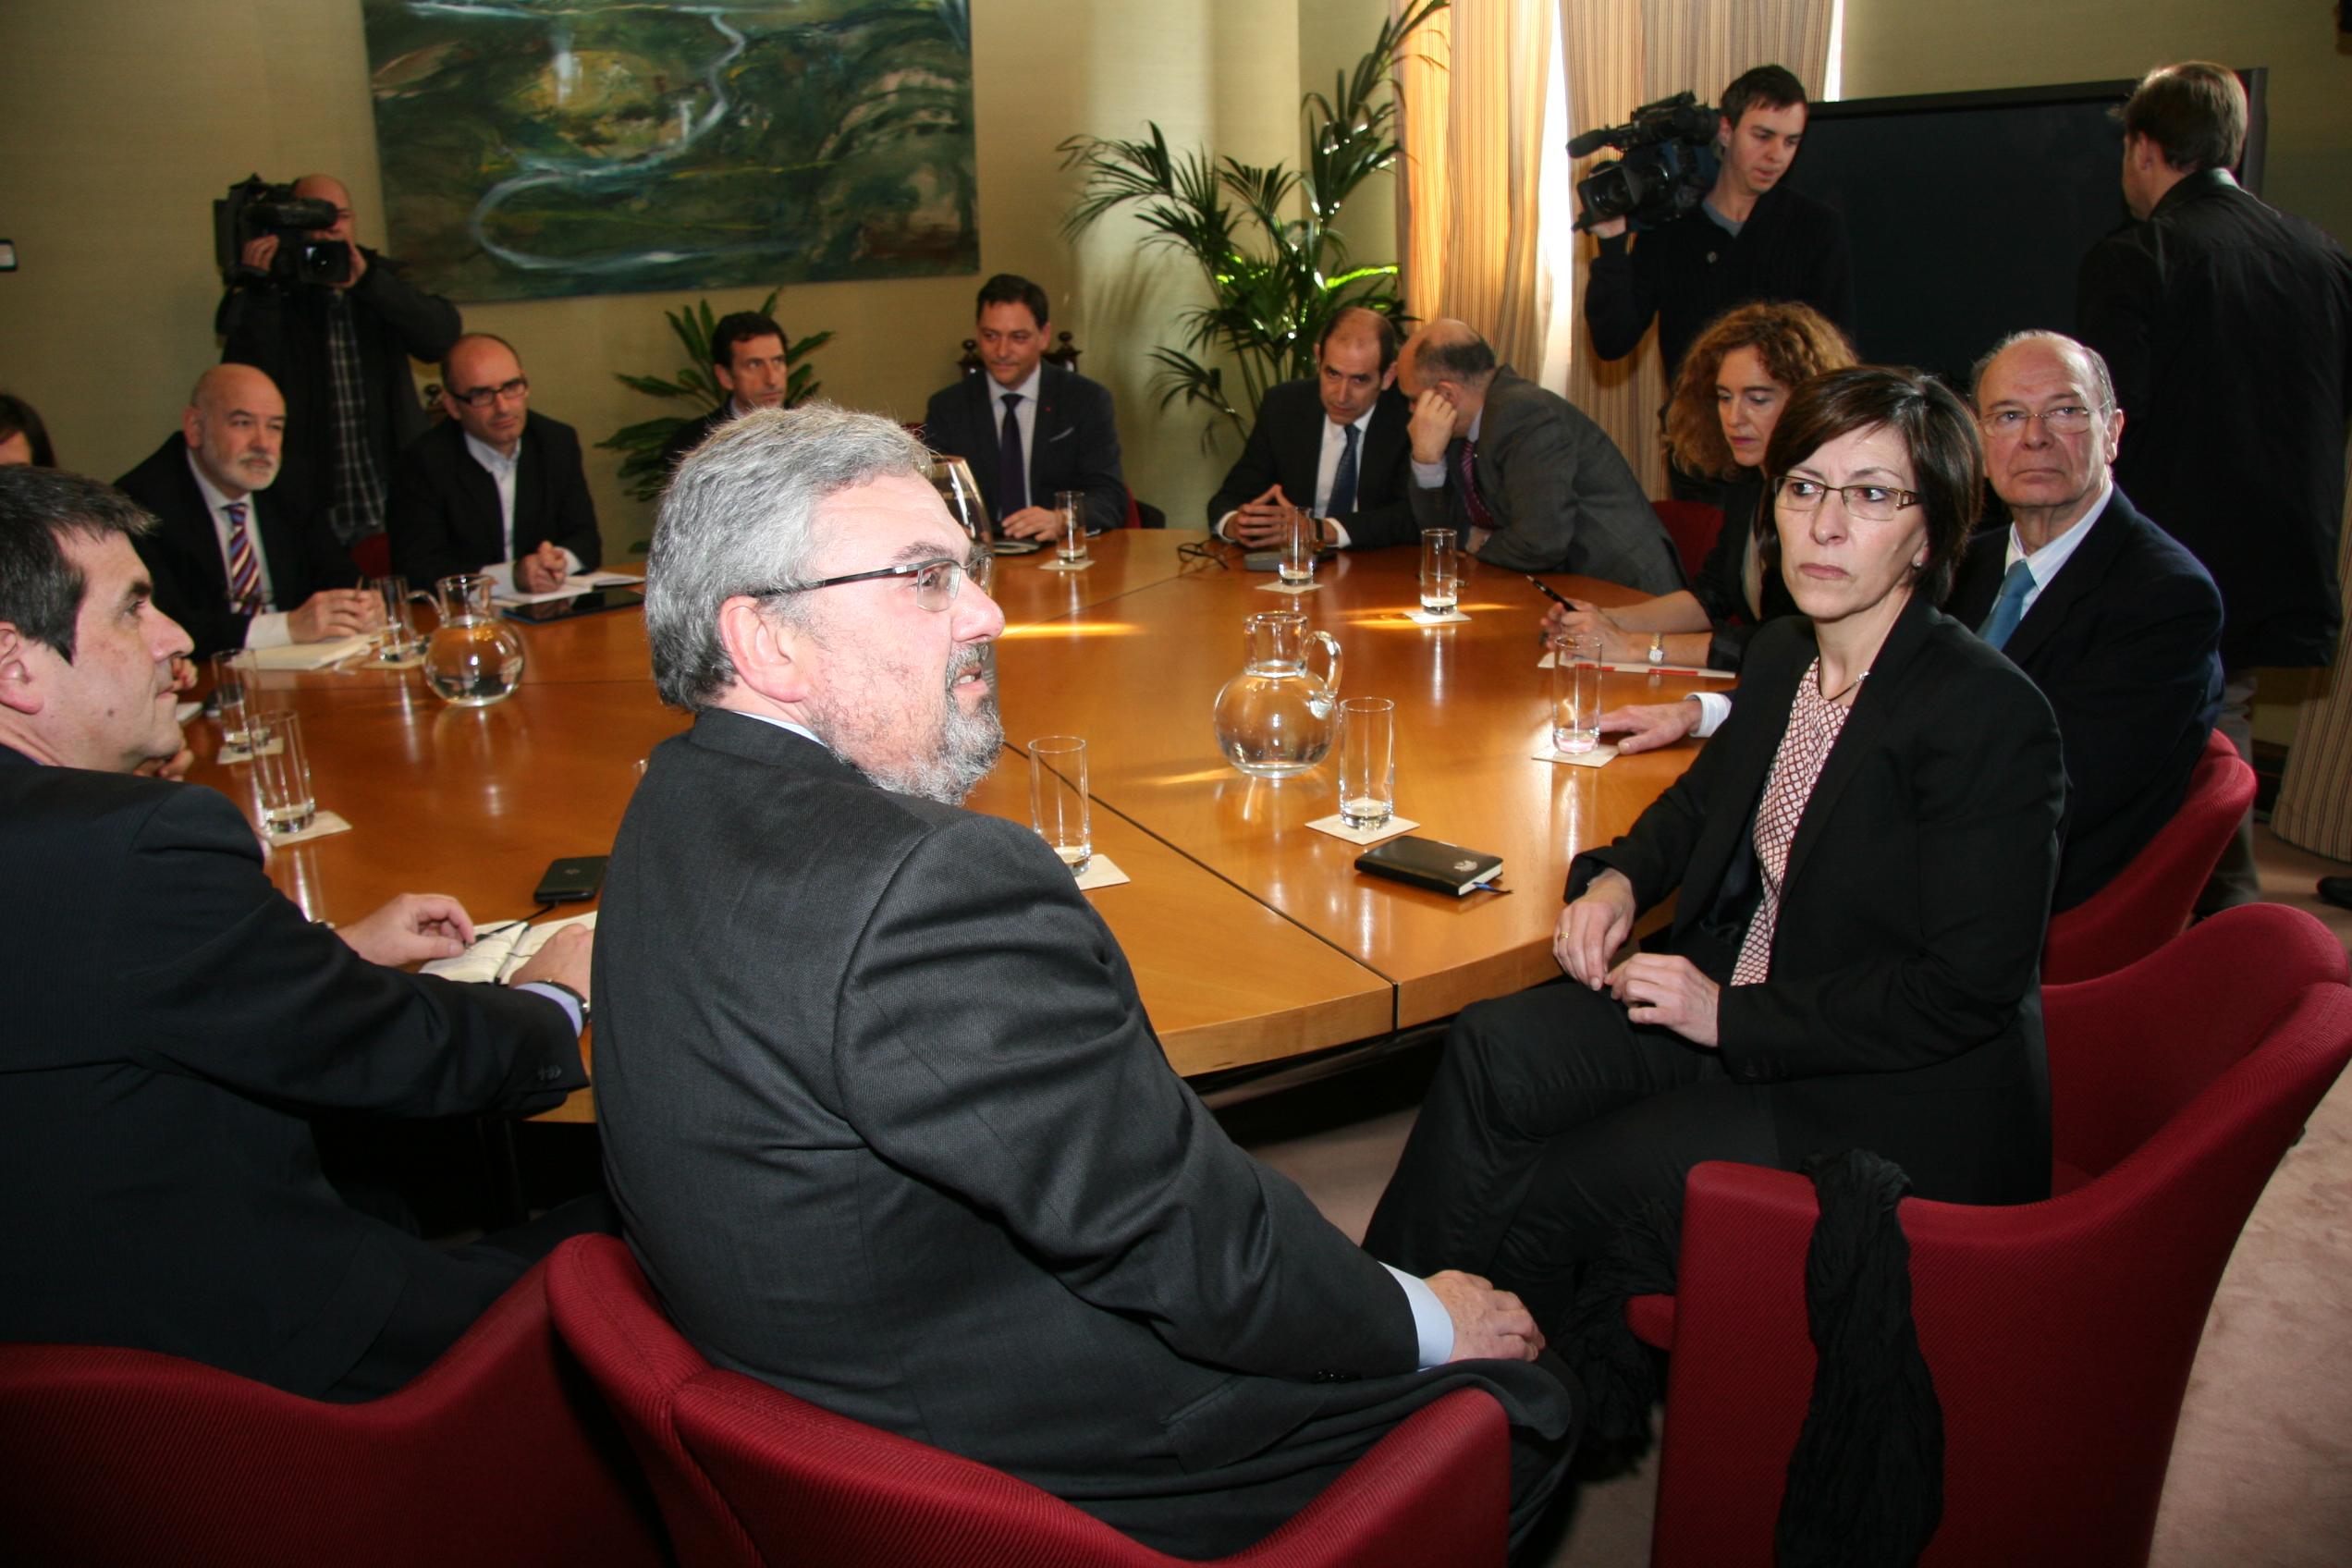 reunion_seguridad_ayuntamiento_bilbao_dendak_05.jpg